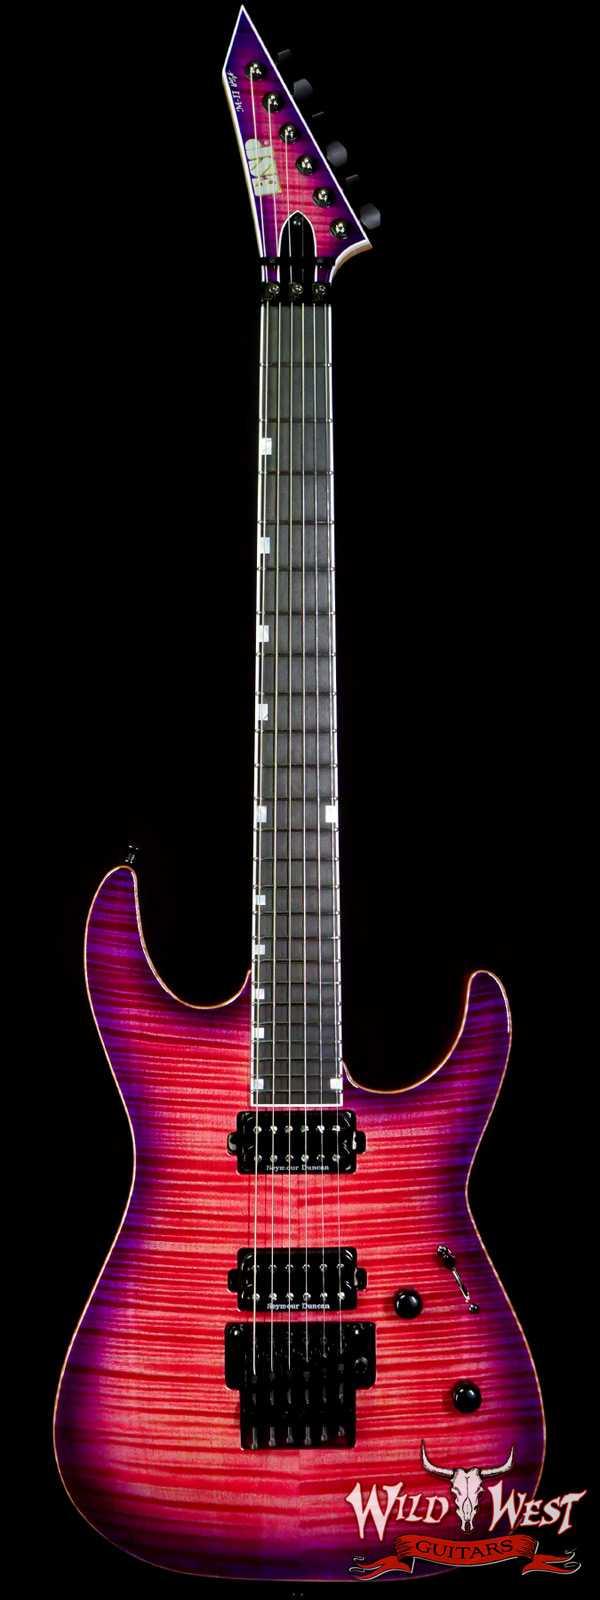 ESP USA M-II DLX FR Floyd Rose Flame Maple Top Ebony Fingerboard Seymour Duncan Pickups Cranberry Burst